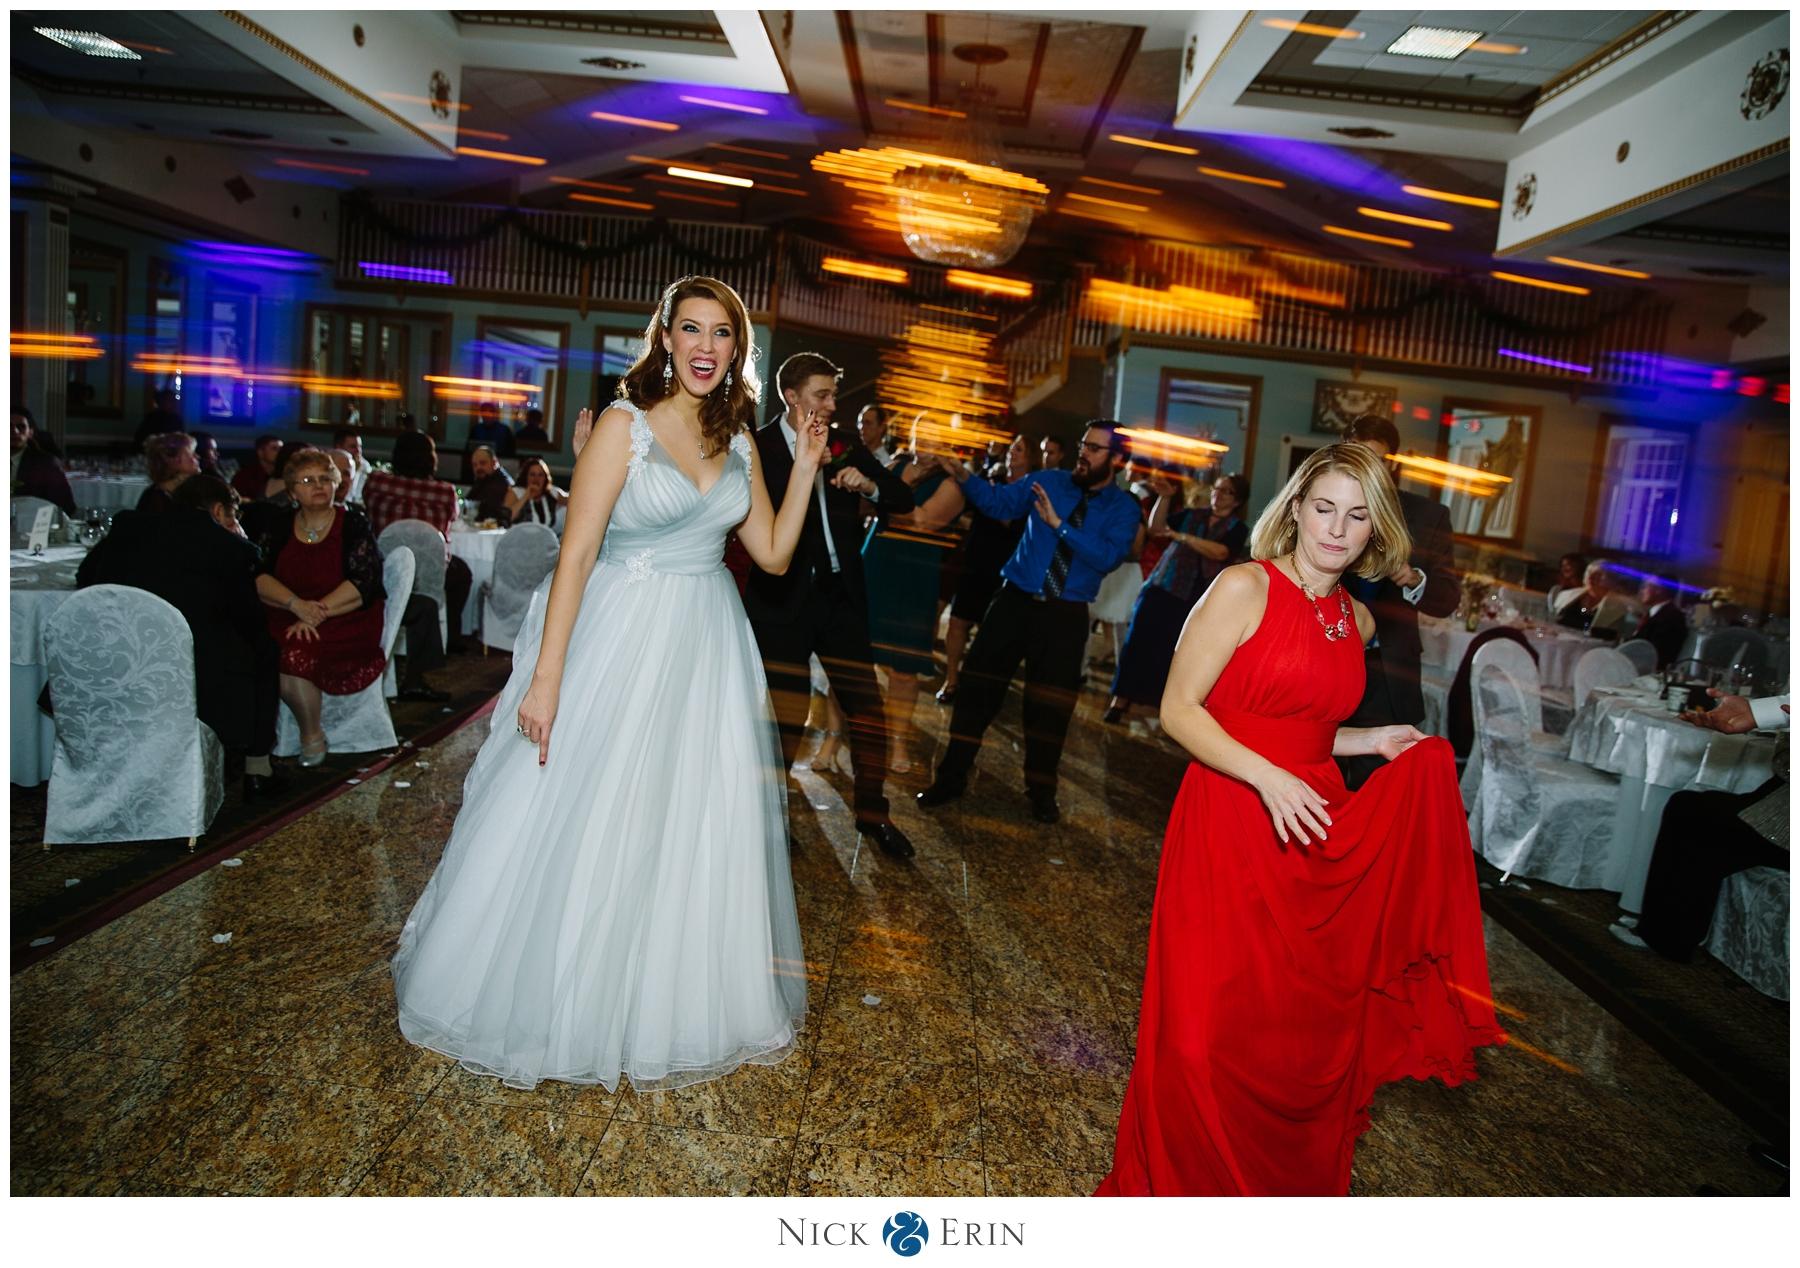 Donner_Photography_Mendenhall Inn Wedding_Blake & Kristina_0043